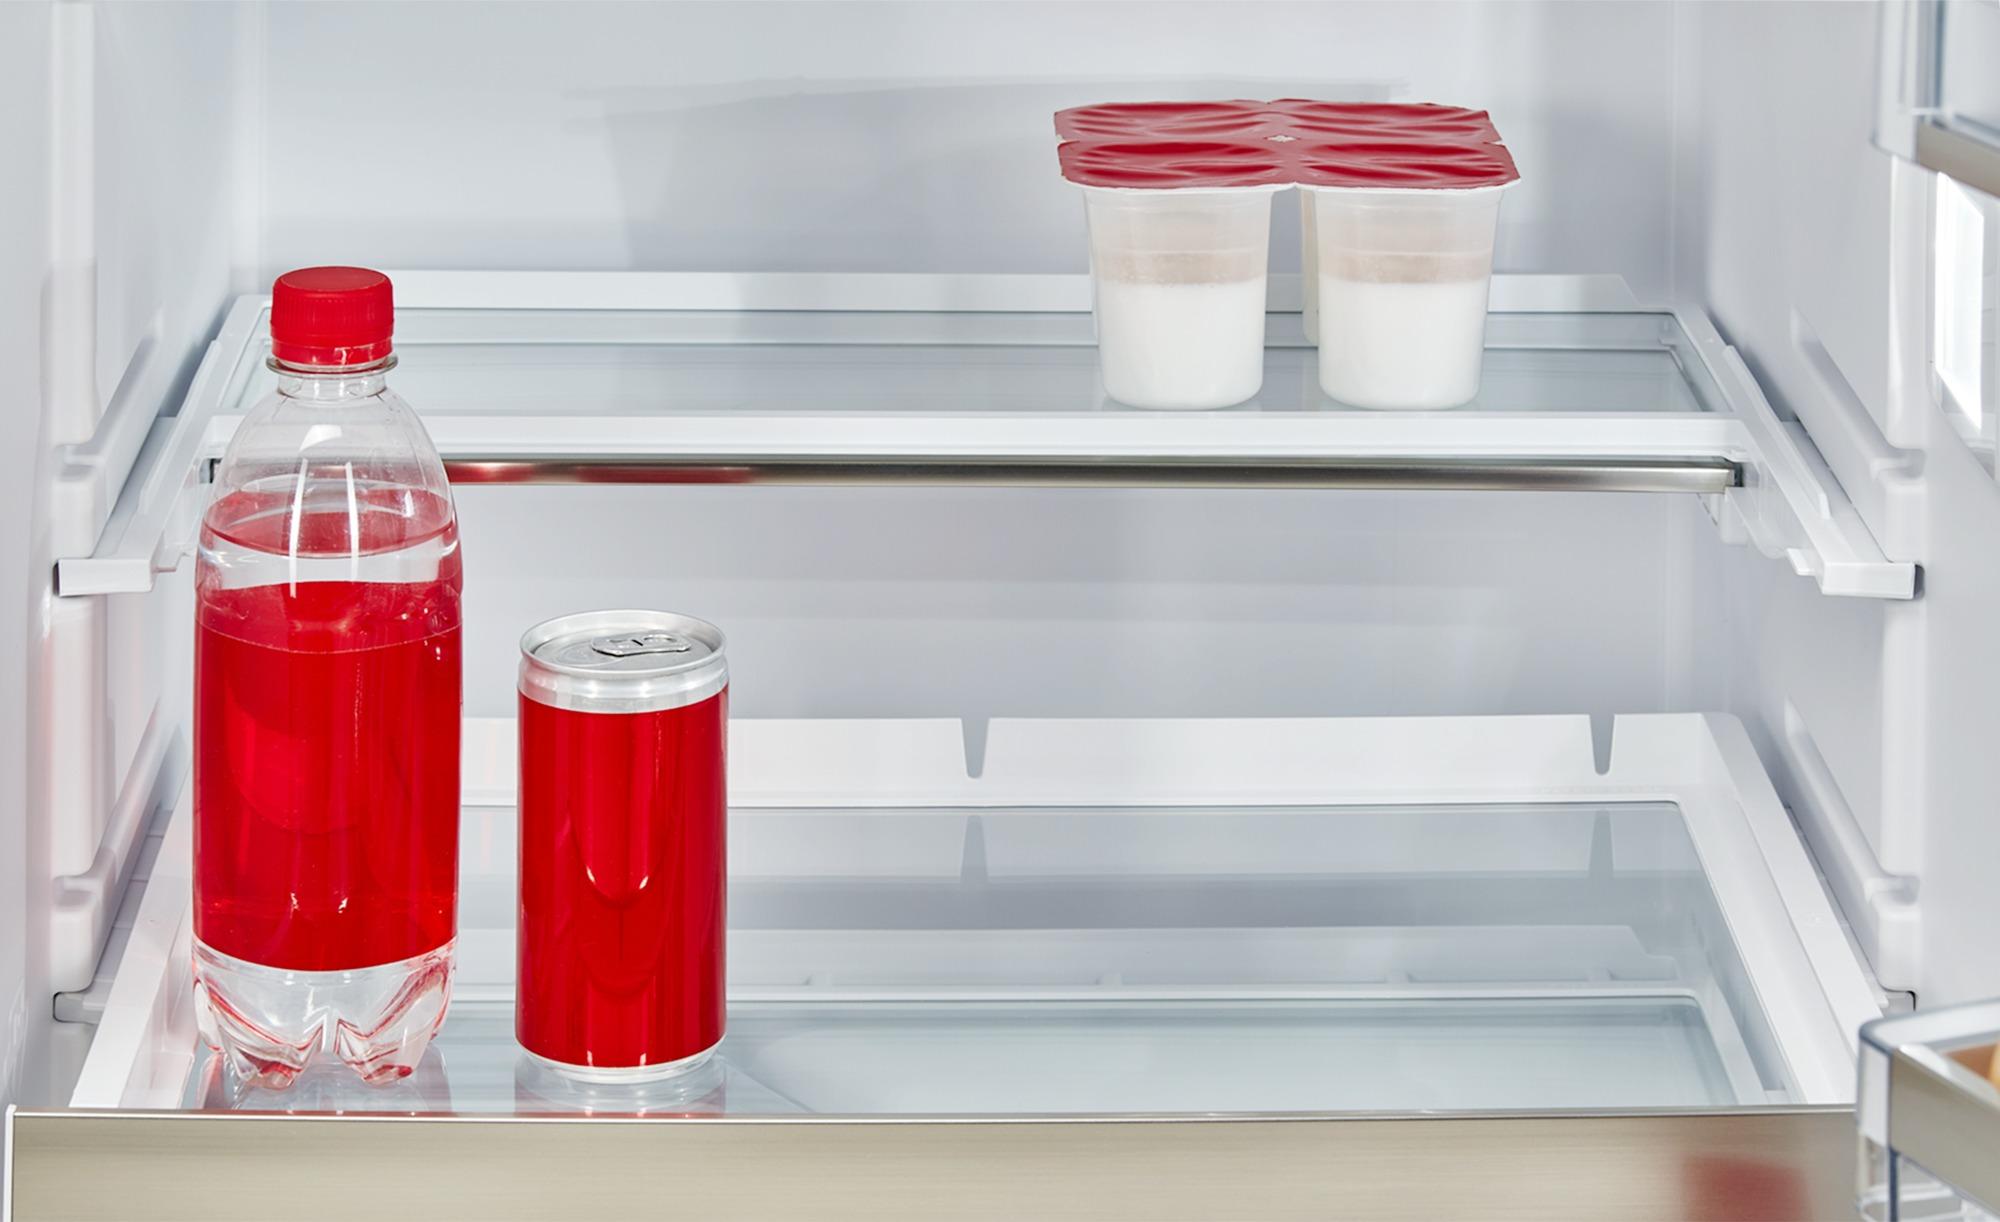 Gorenje Kühlschrank Alarm : Siemens einbau kühlschrank ki rad bei möbel kraft online